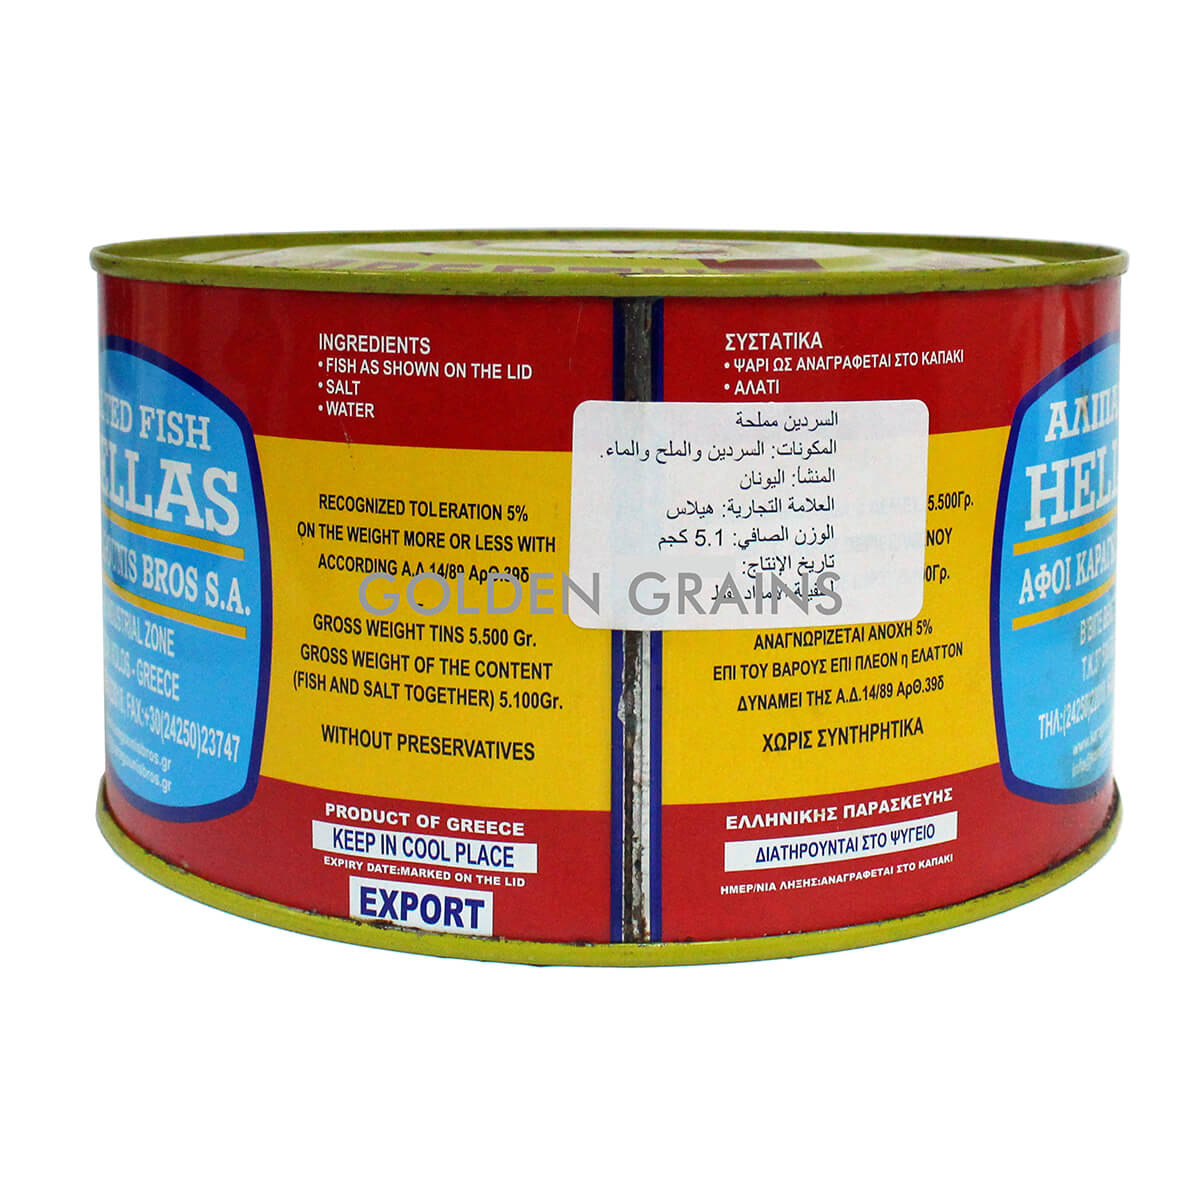 Golden Grains Dubai Export - Hellas - Canned Sardines - Back.jpg